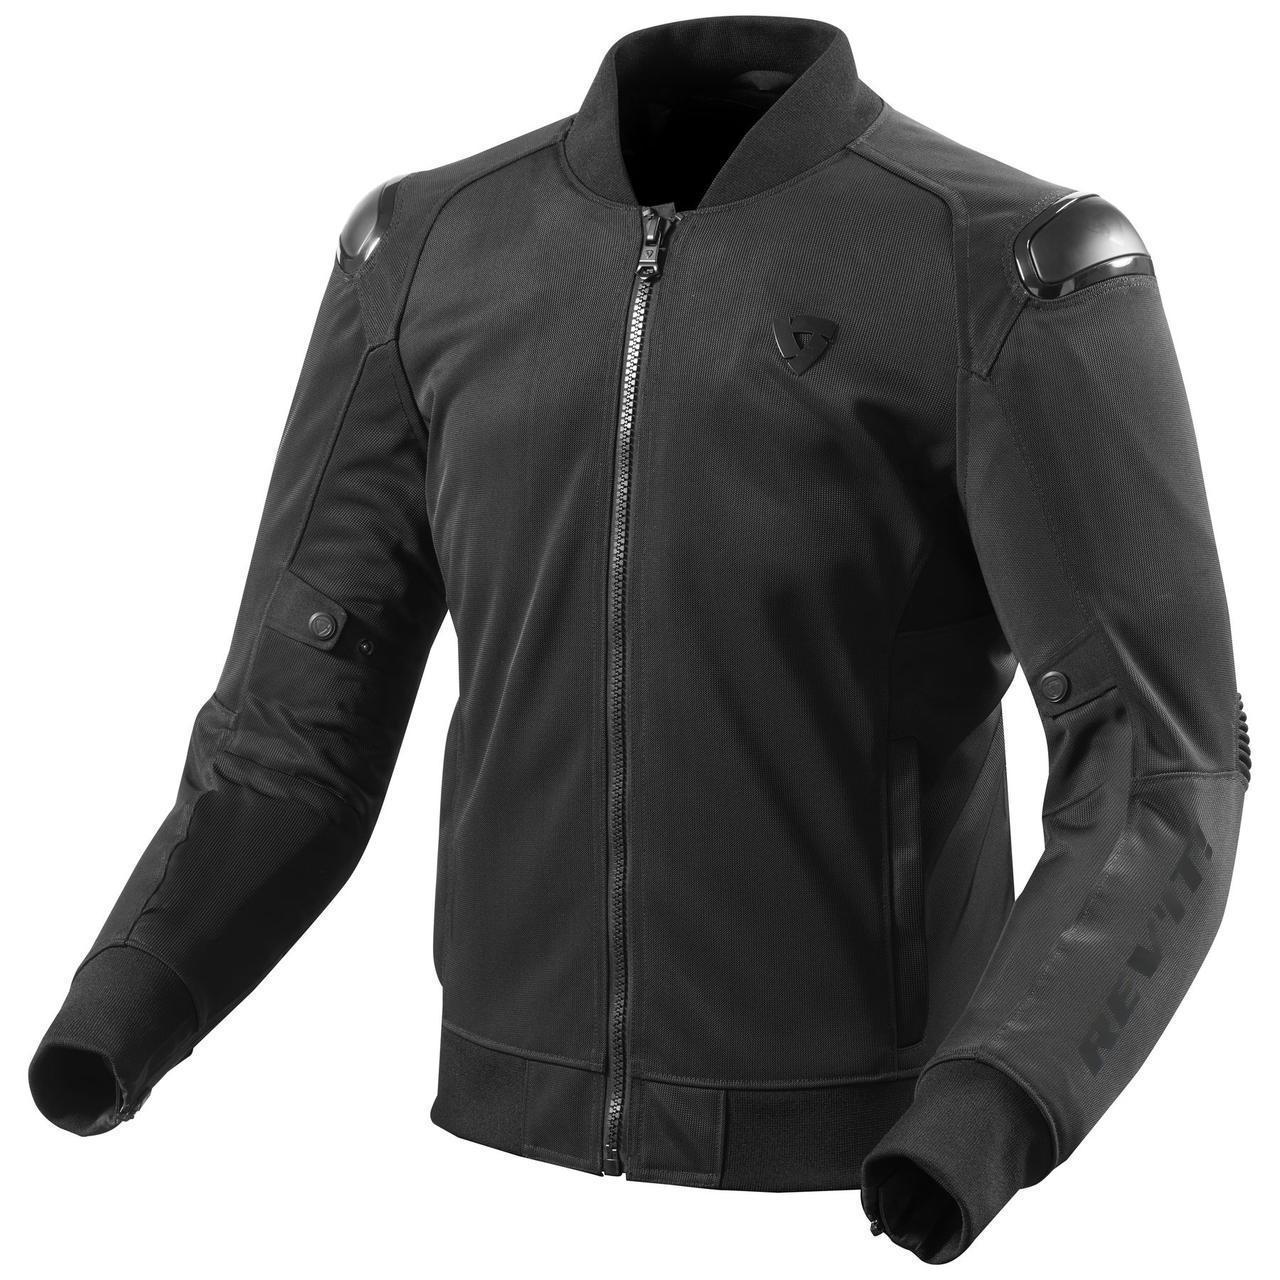 Мотокуртка Revit TRACTION текстиль р. XL black